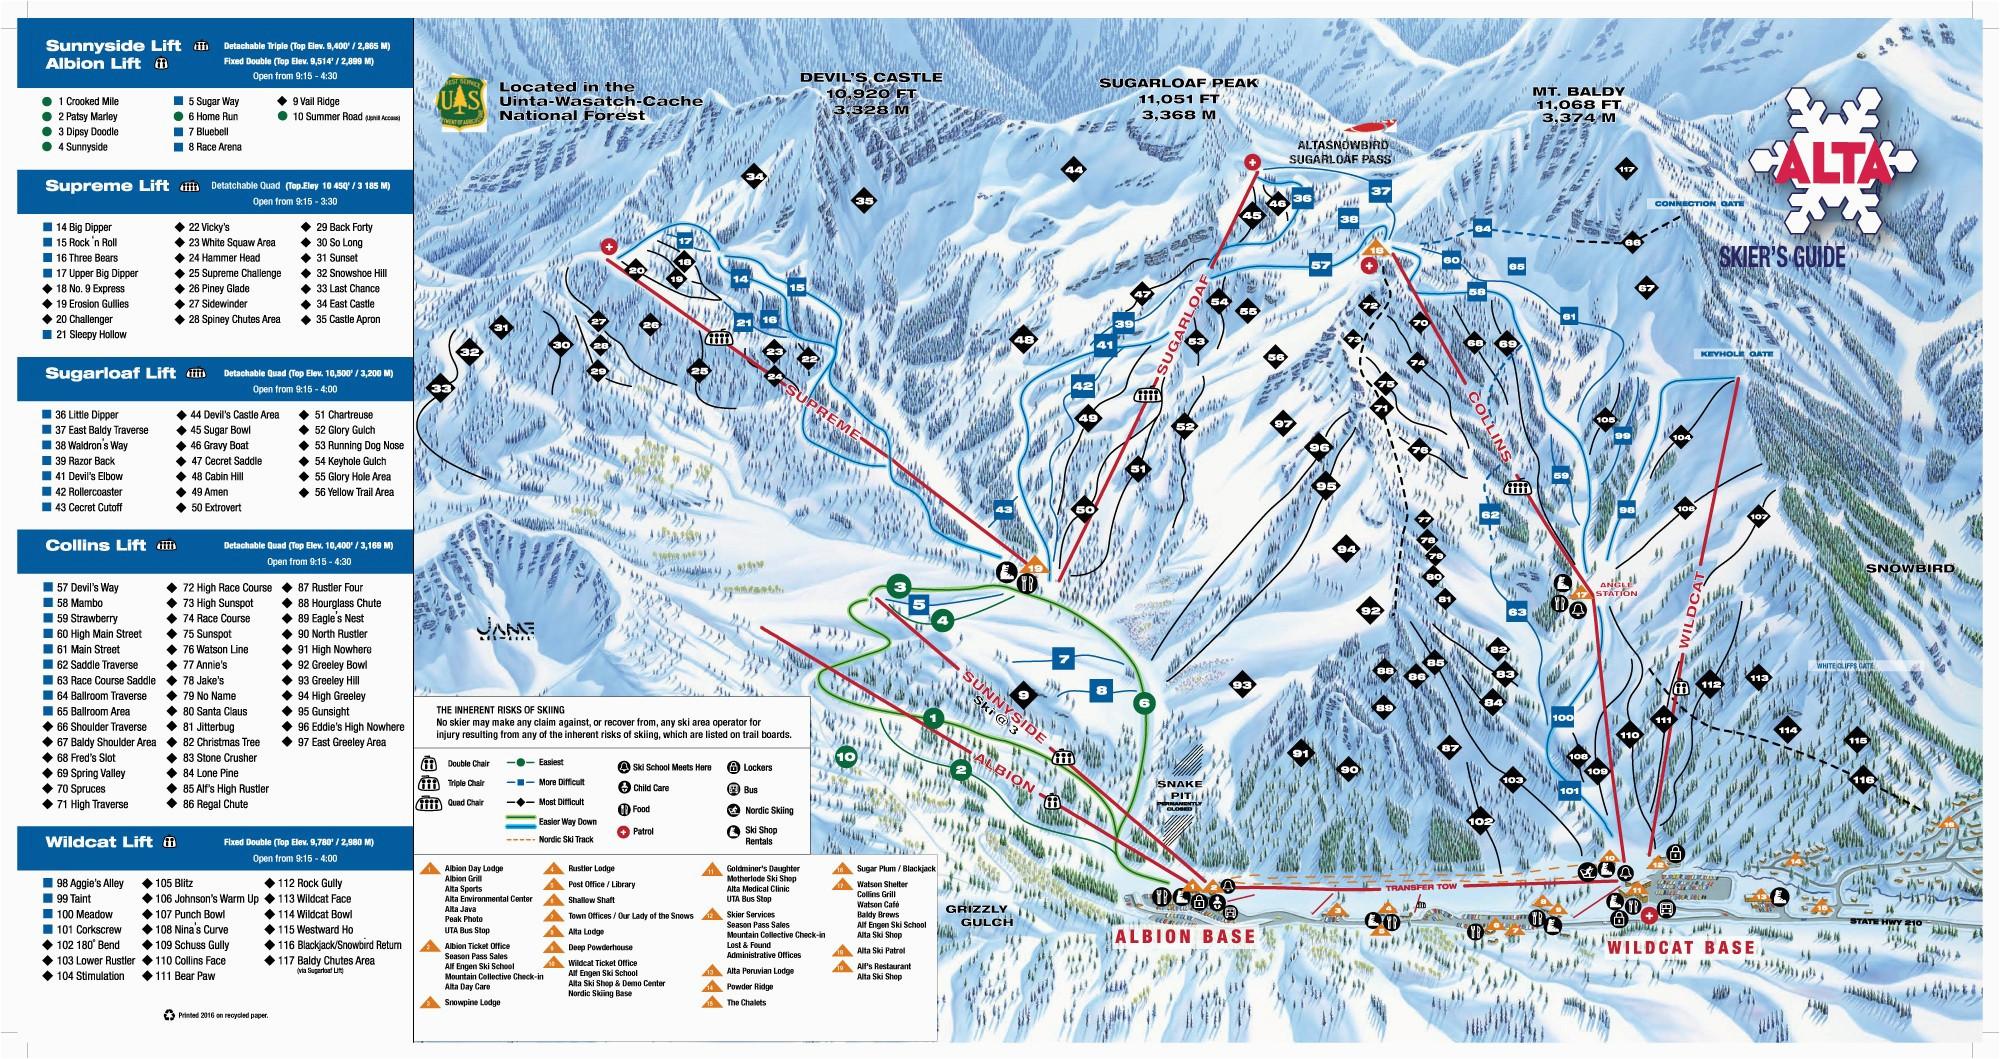 Southern Colorado Ski Resorts Map Us East Coast Ski Resorts Map New ...